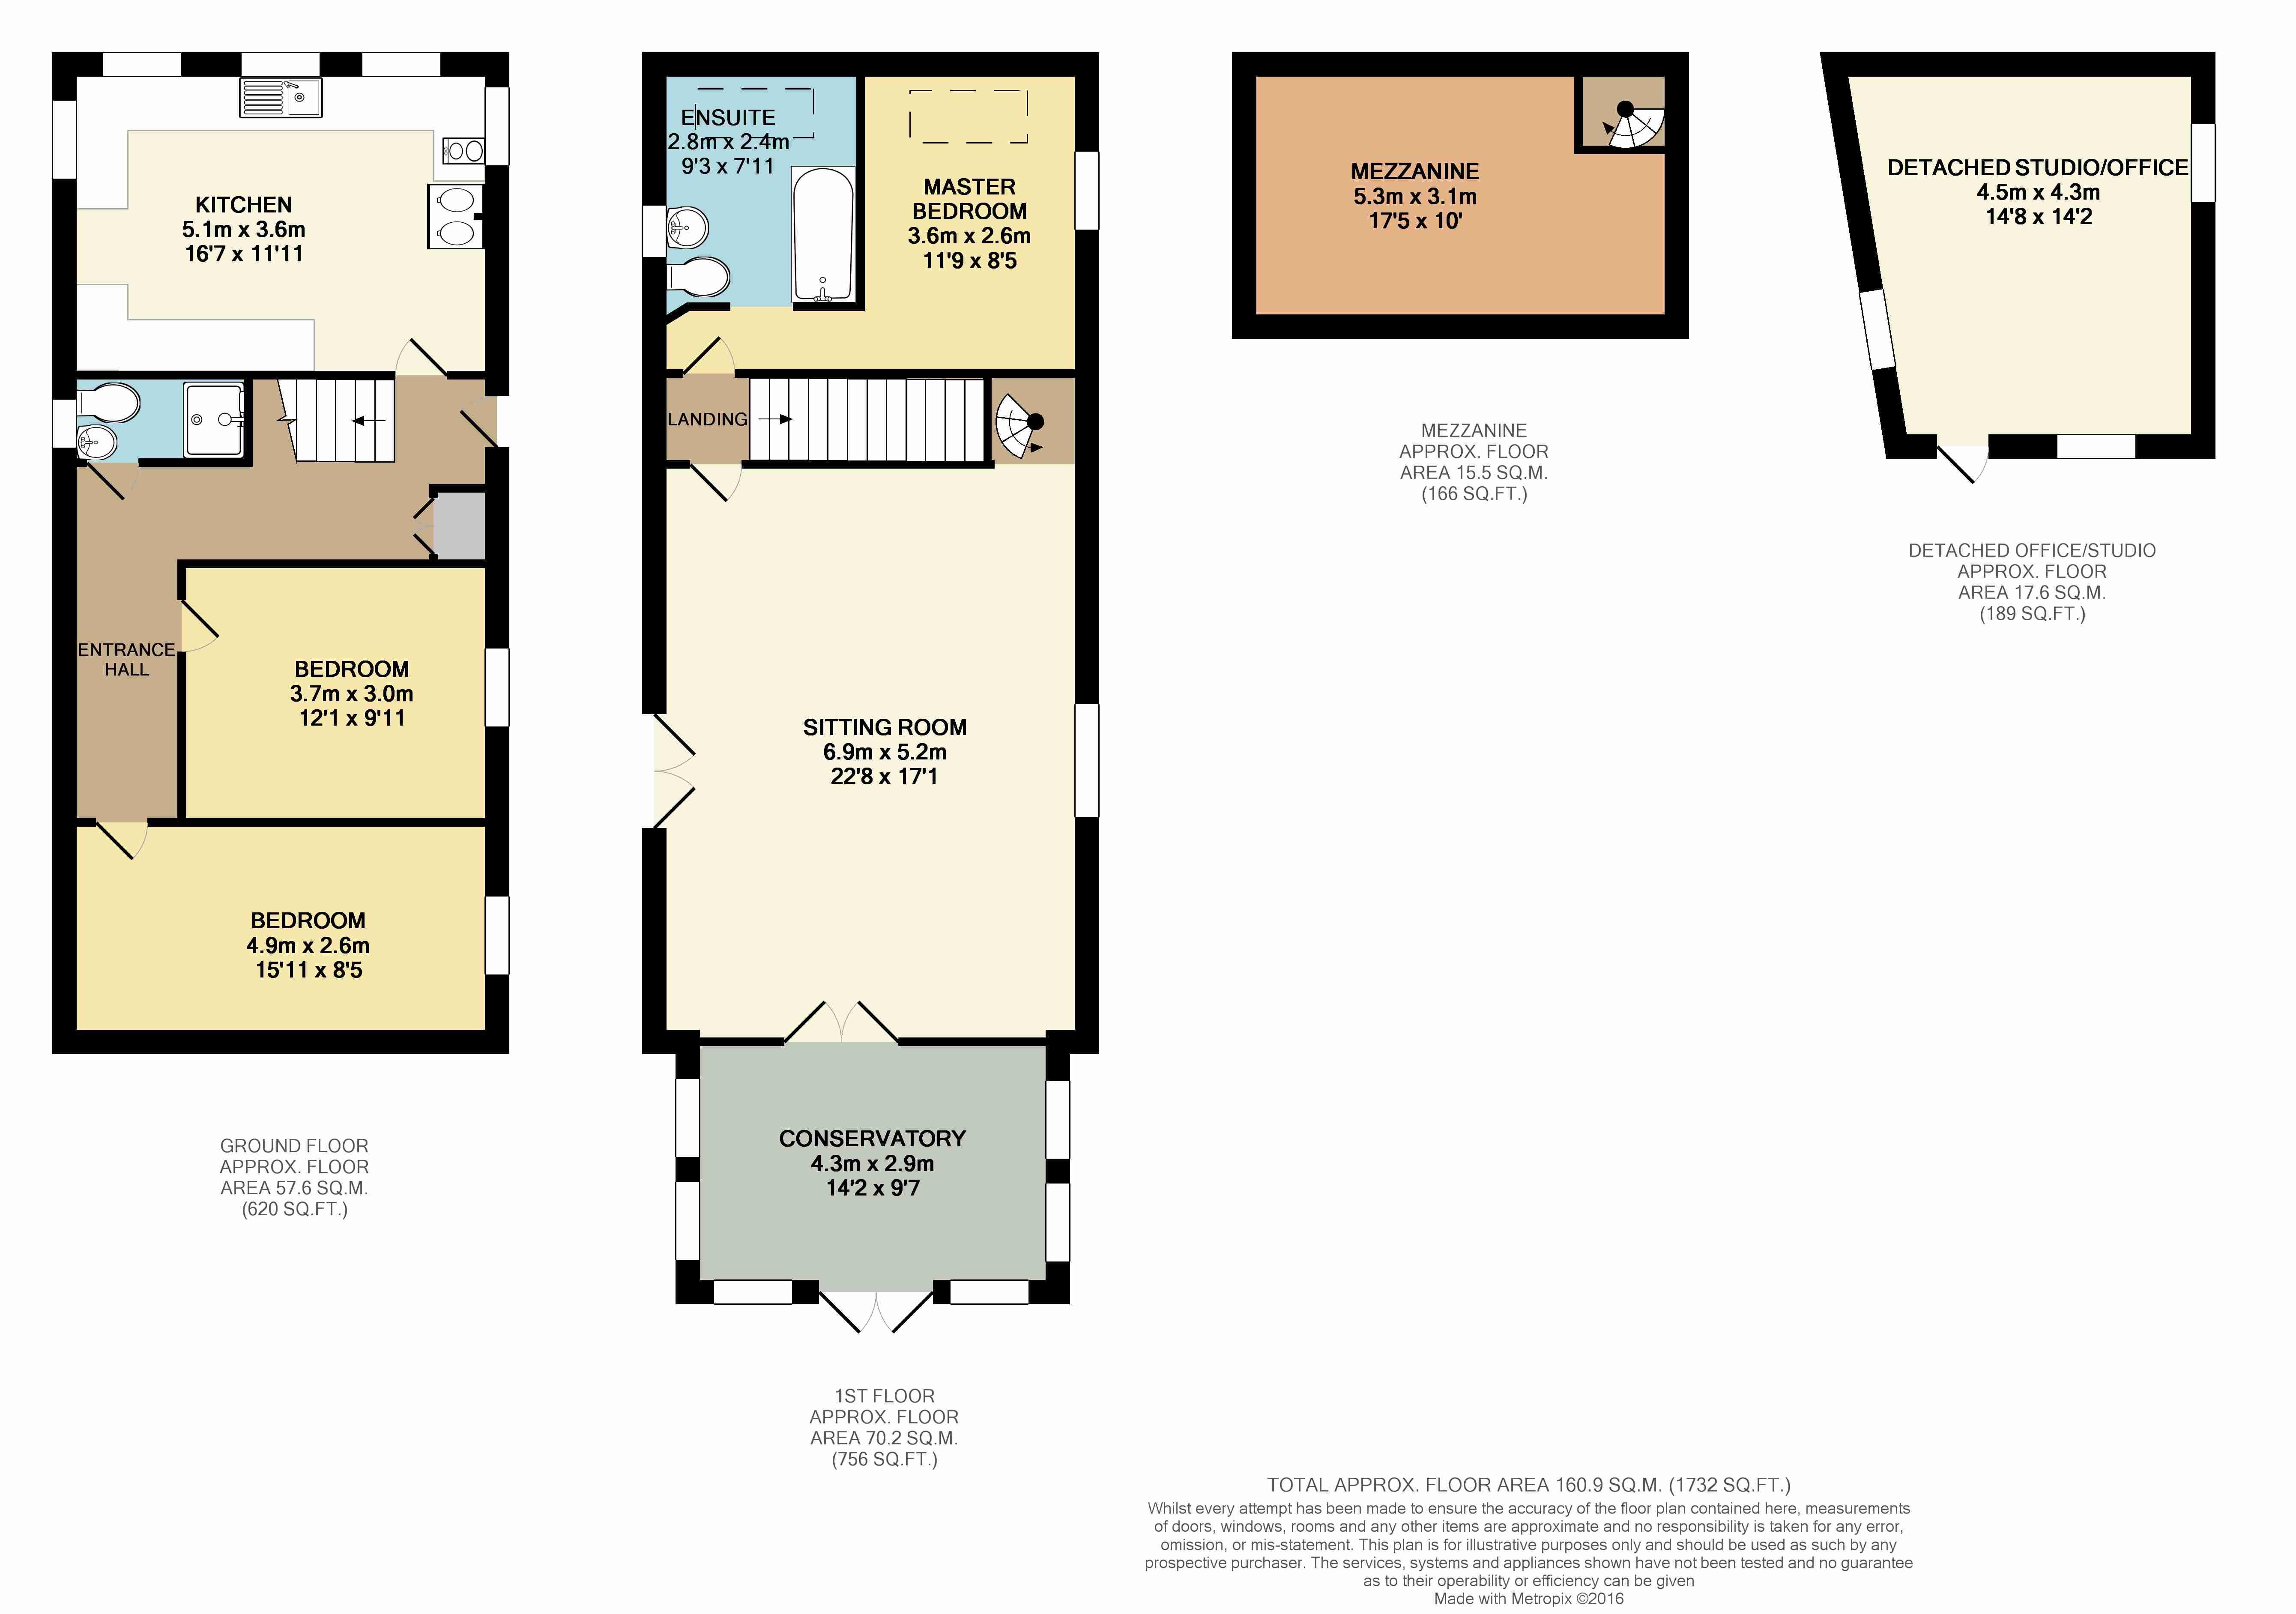 Pentyak harlyn bay floor plan crowdbuild for for Kitchen design 5m x 6m